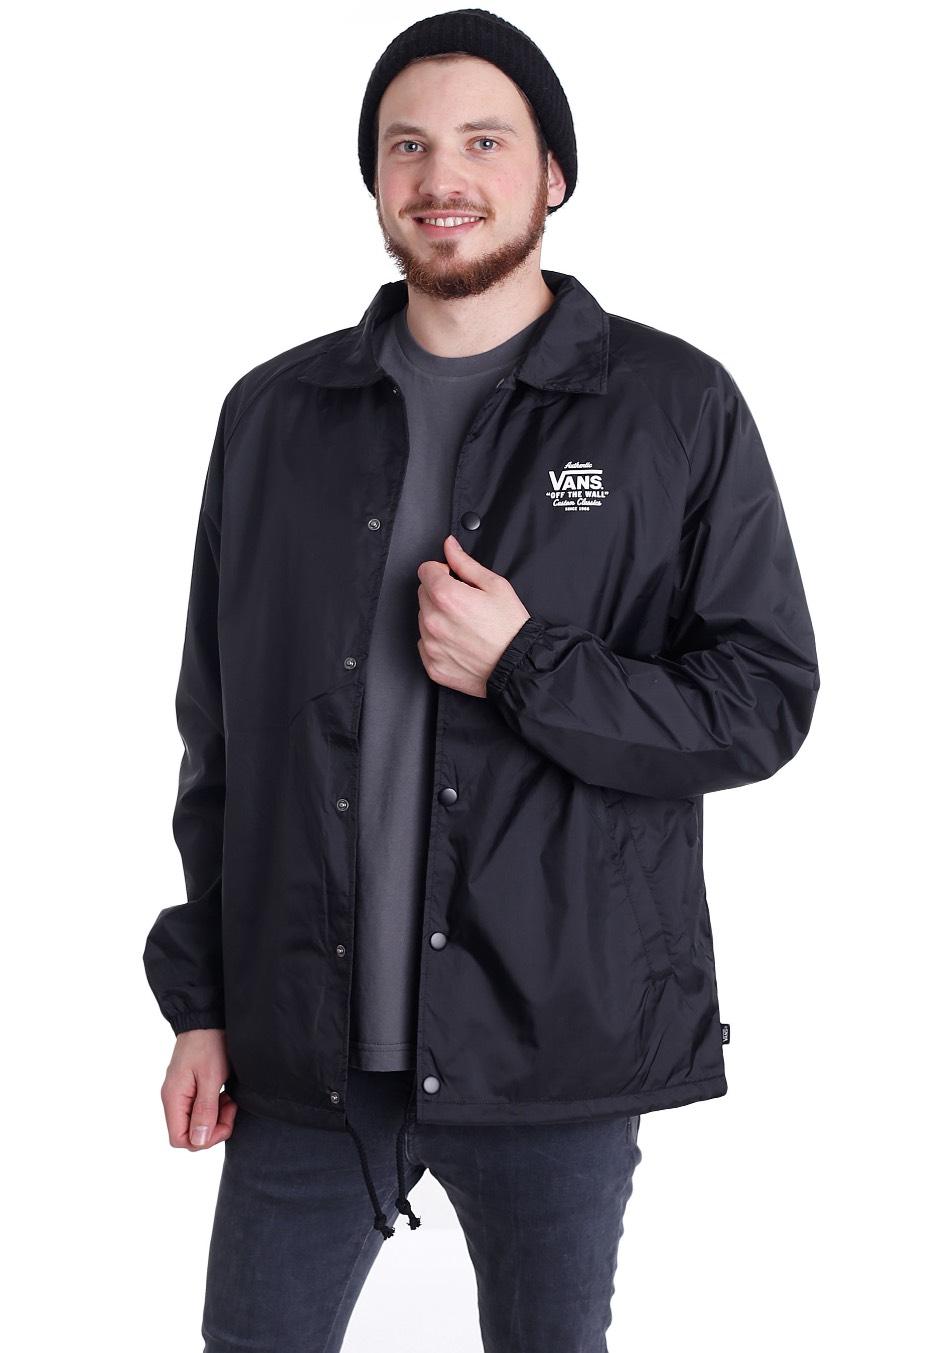 Vans Torrey Black White Jacket Impericon Com Au